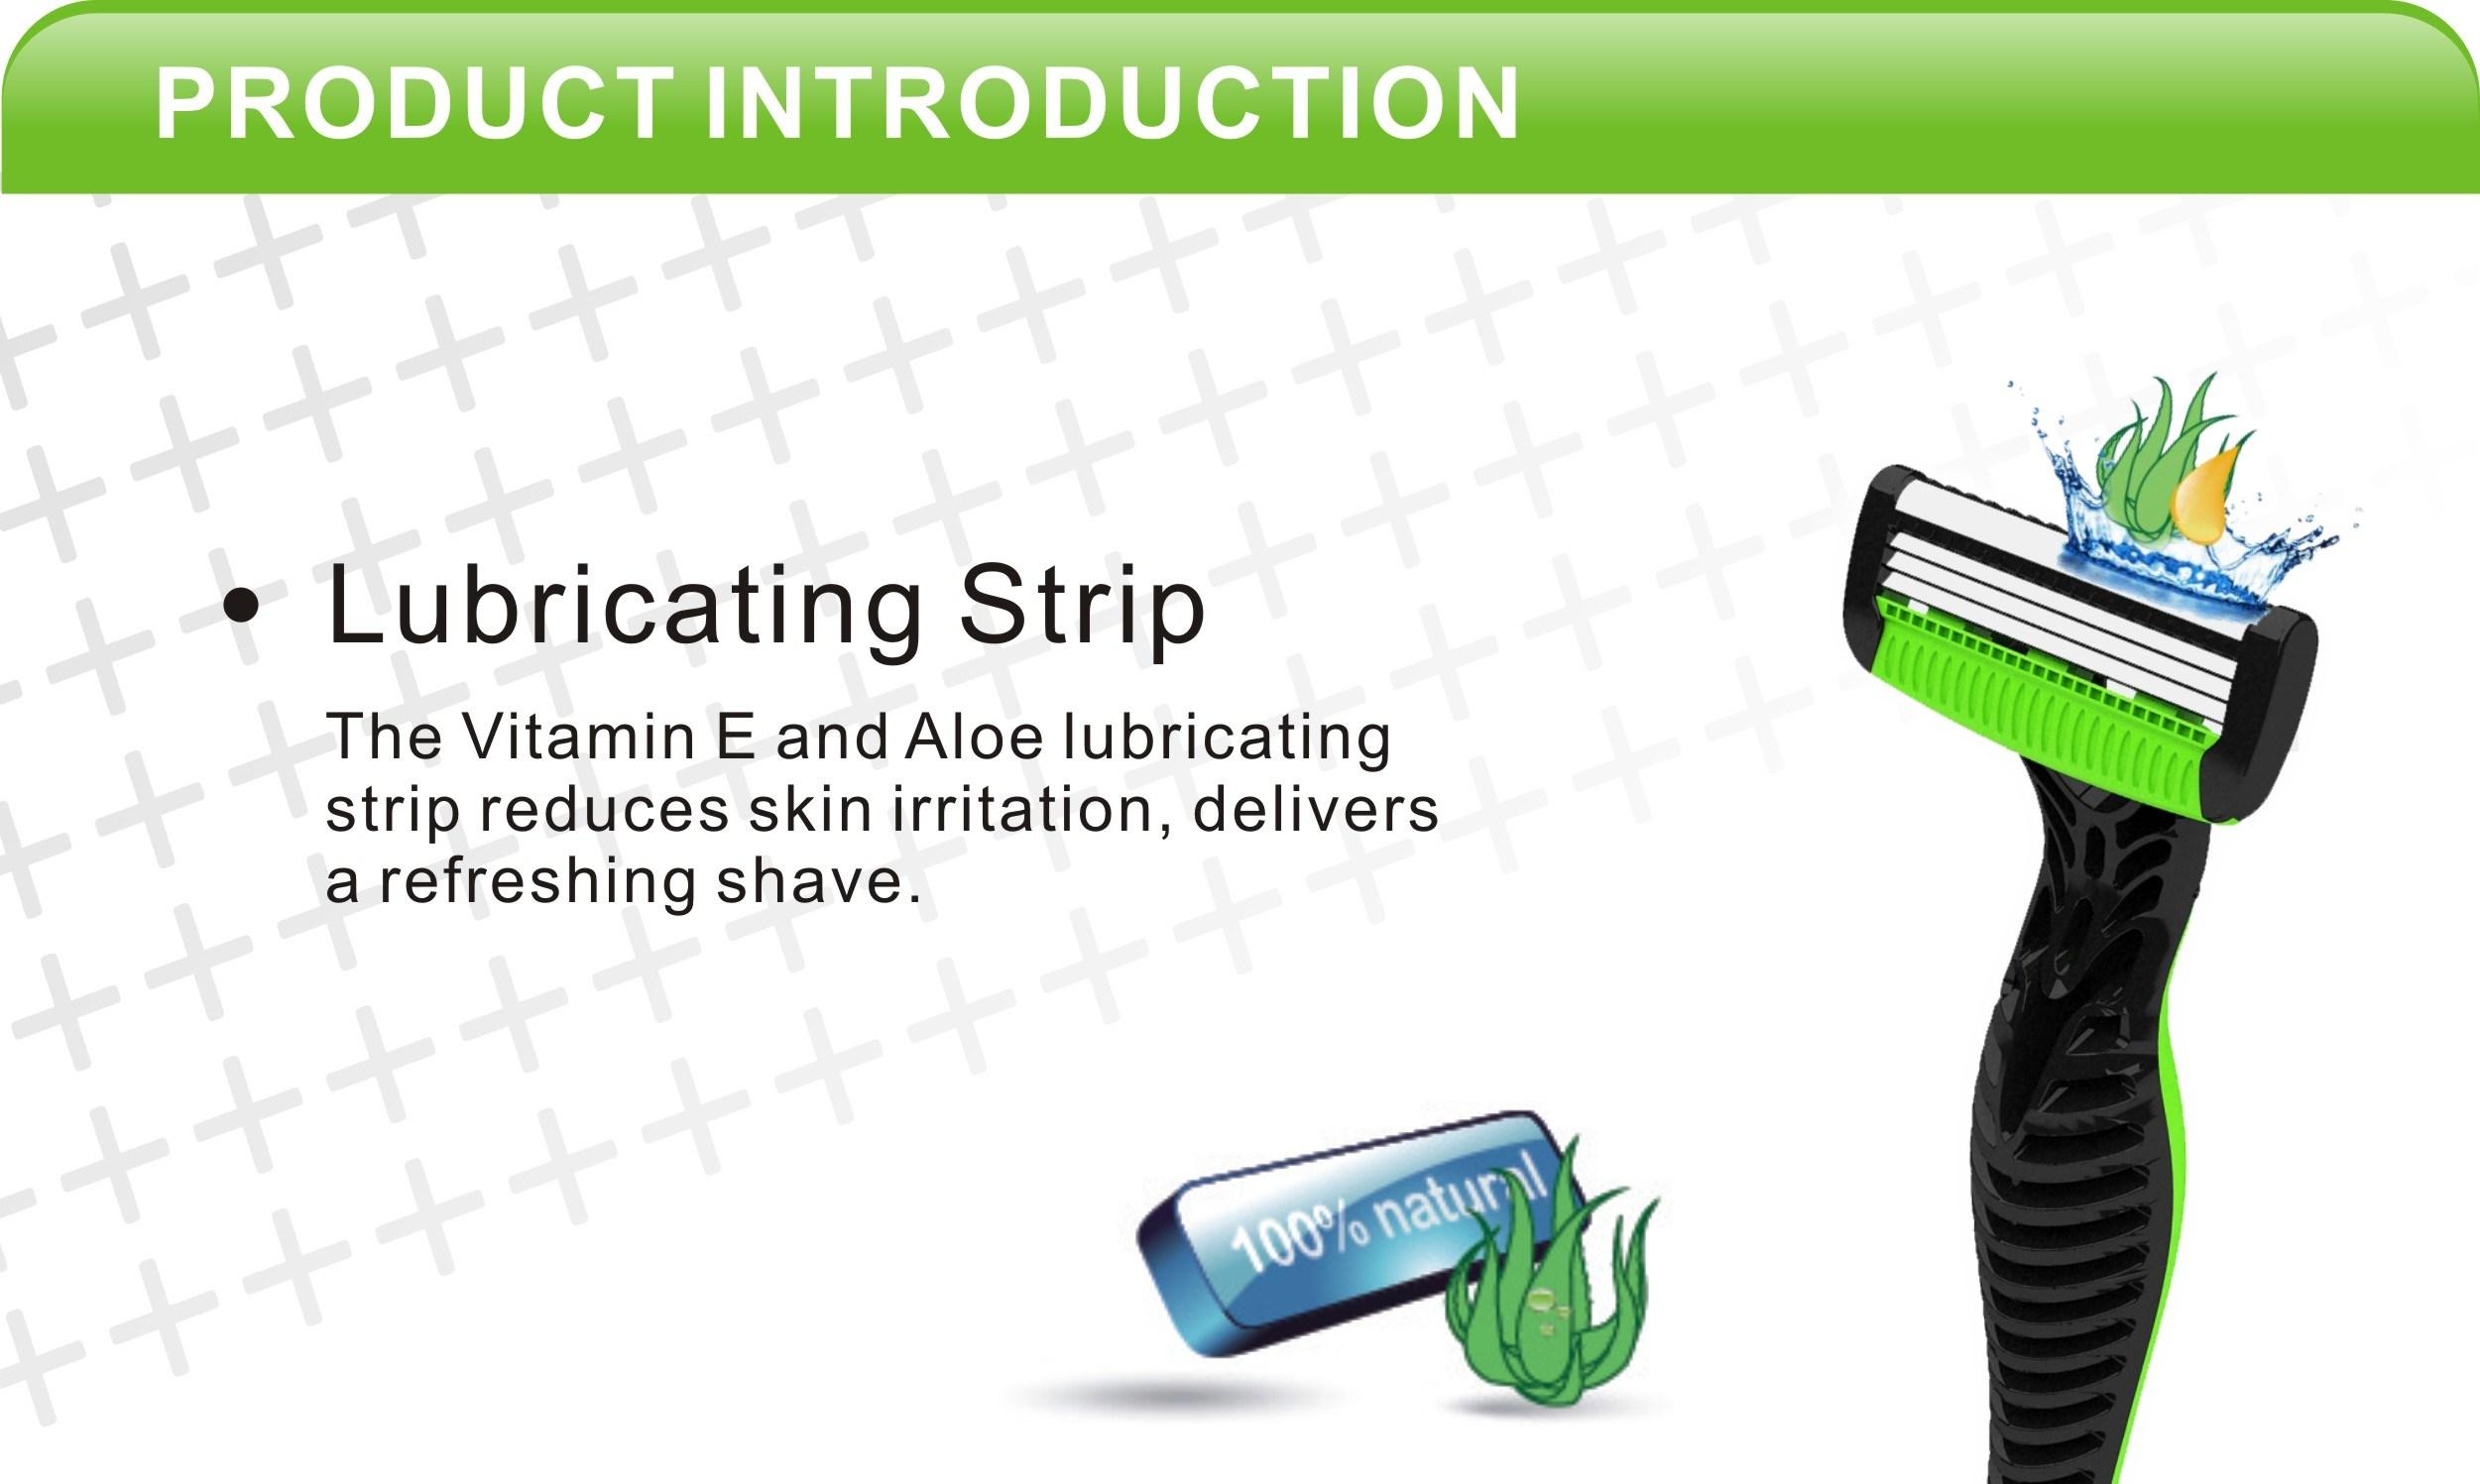 4 Blade Disposable Razor Factory Direct Supply Plastic Shaver, Plastic Shaving Razor,